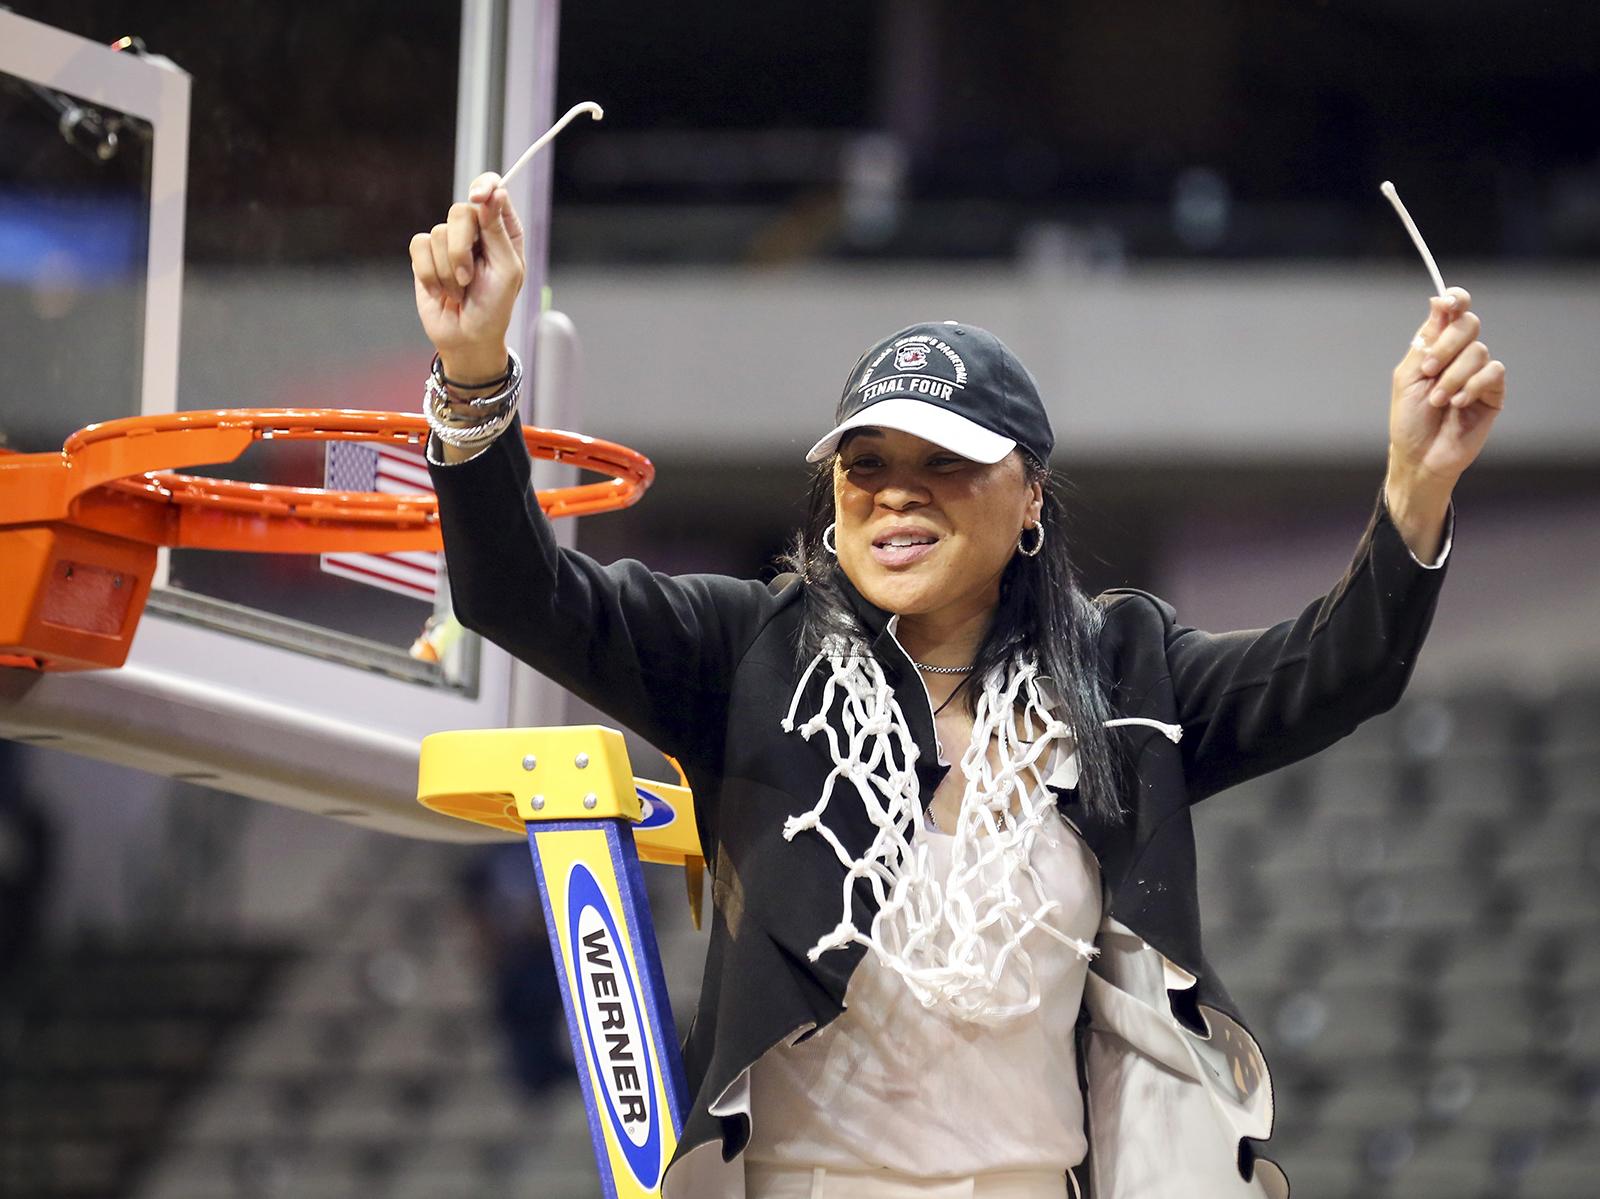 South Carolina women sweep No. 1 spots to close season